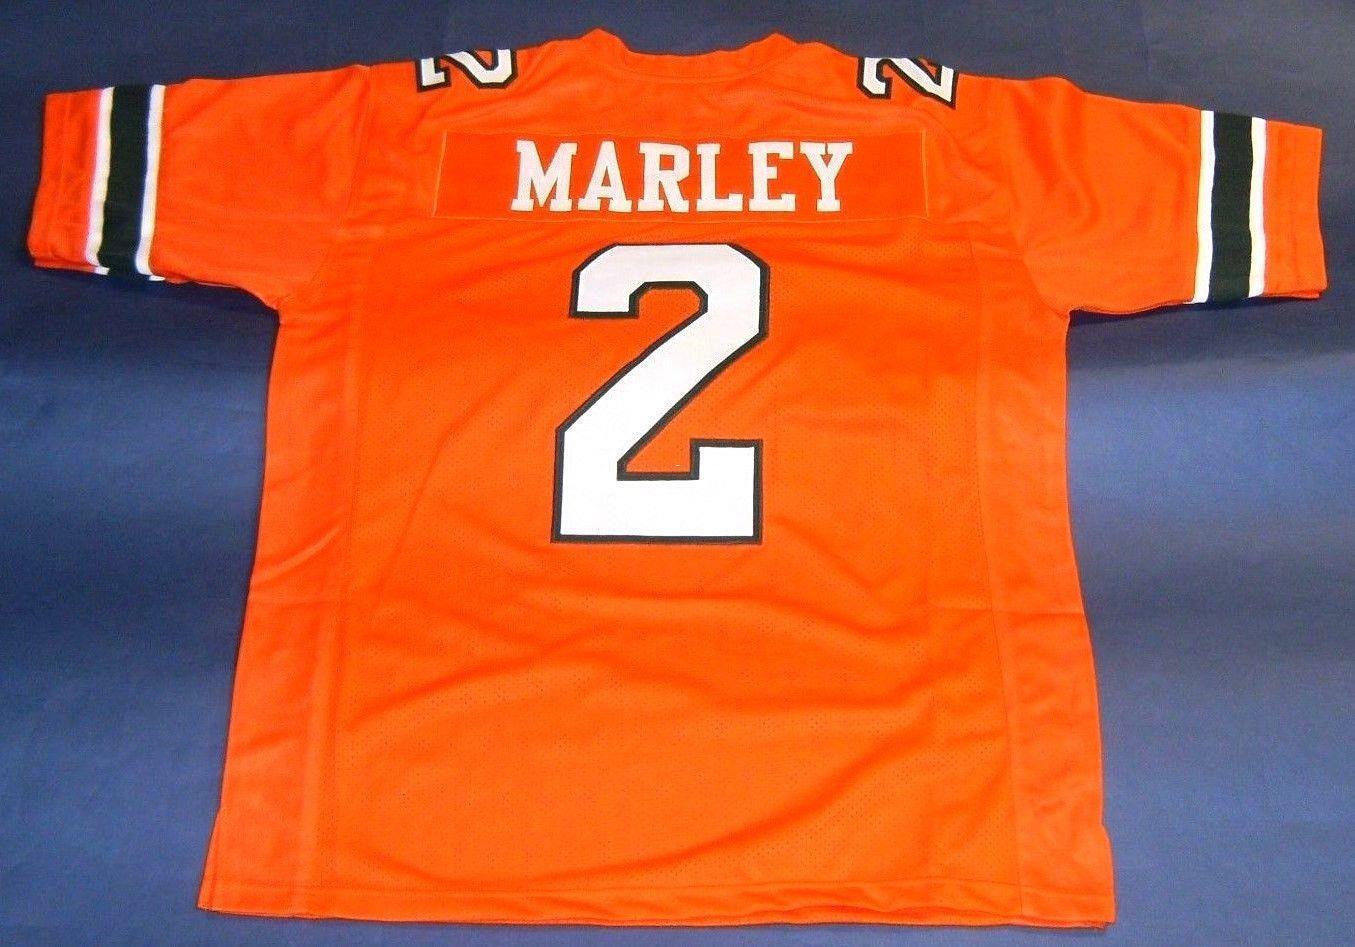 efaa6fbfe ... release date orange nike college football jersey classic styles ae5e0  edbaf cheap 2 rohan marley custom sweden jim kelly autographed miami  hurricanes ...